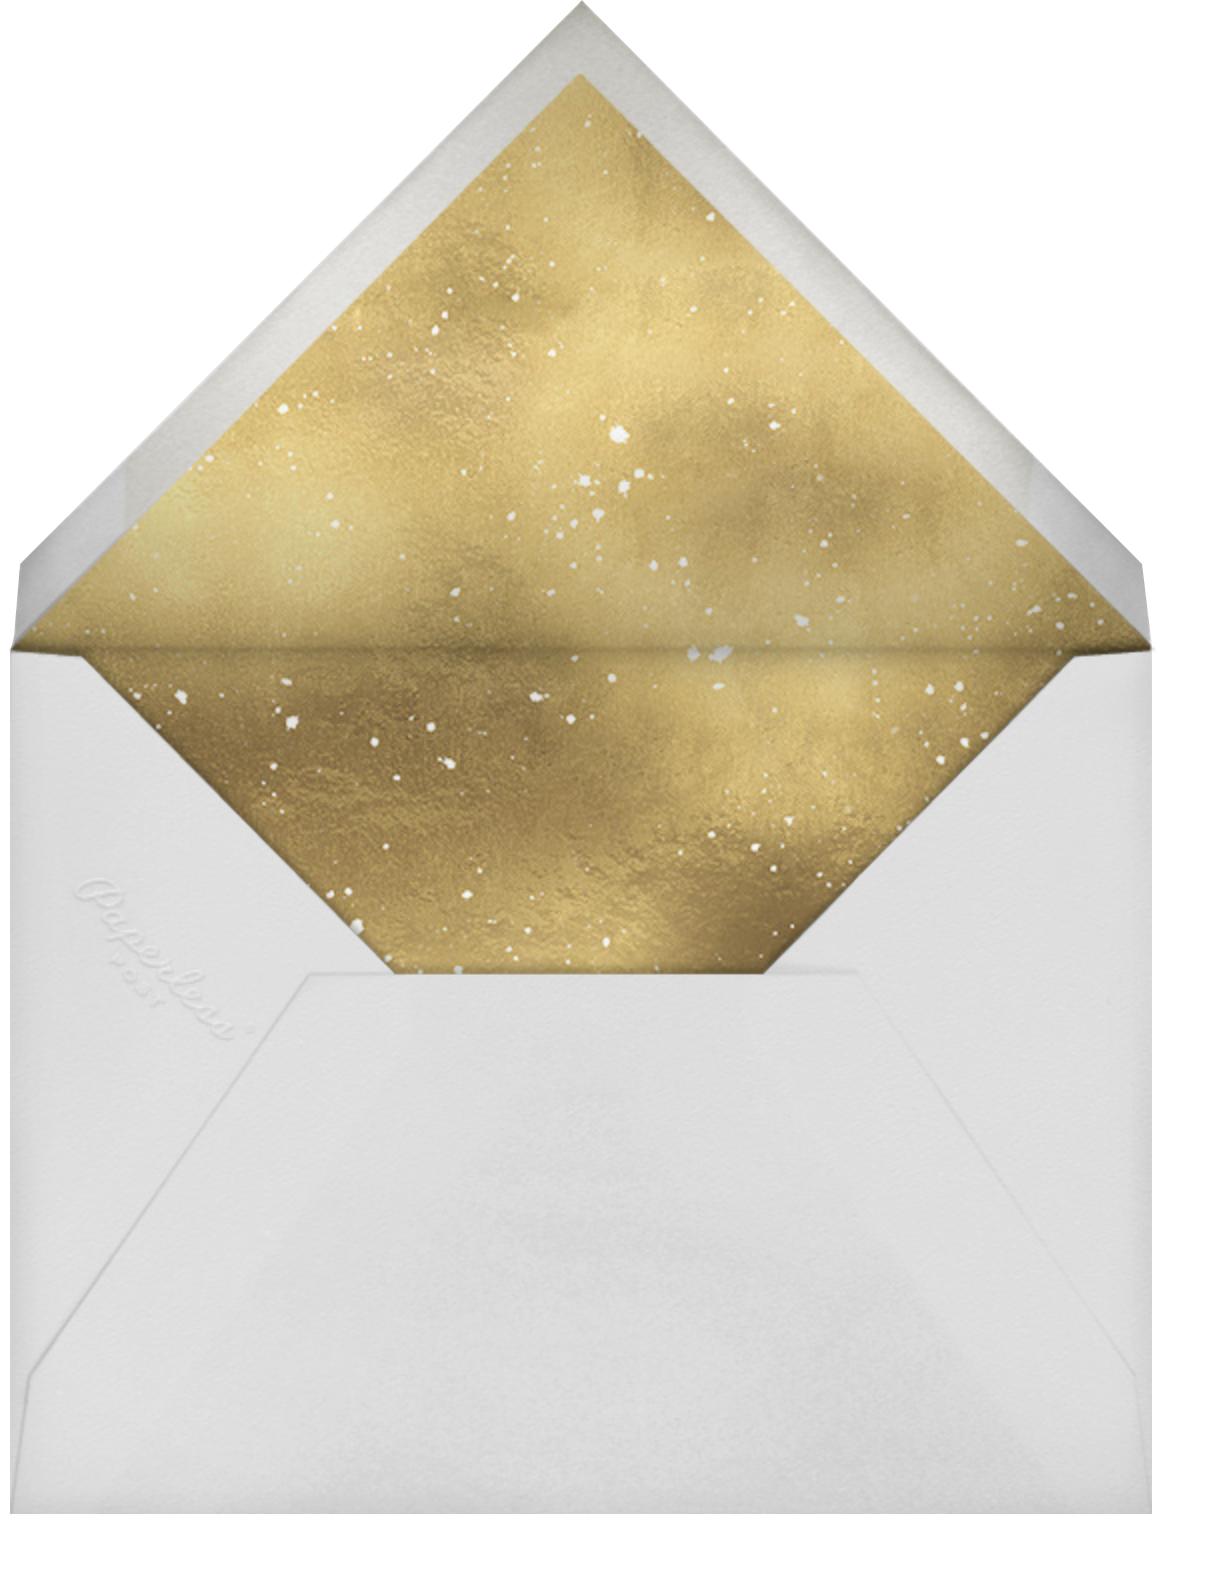 Johanna Photo - White - Paperless Post - Photo  - envelope back